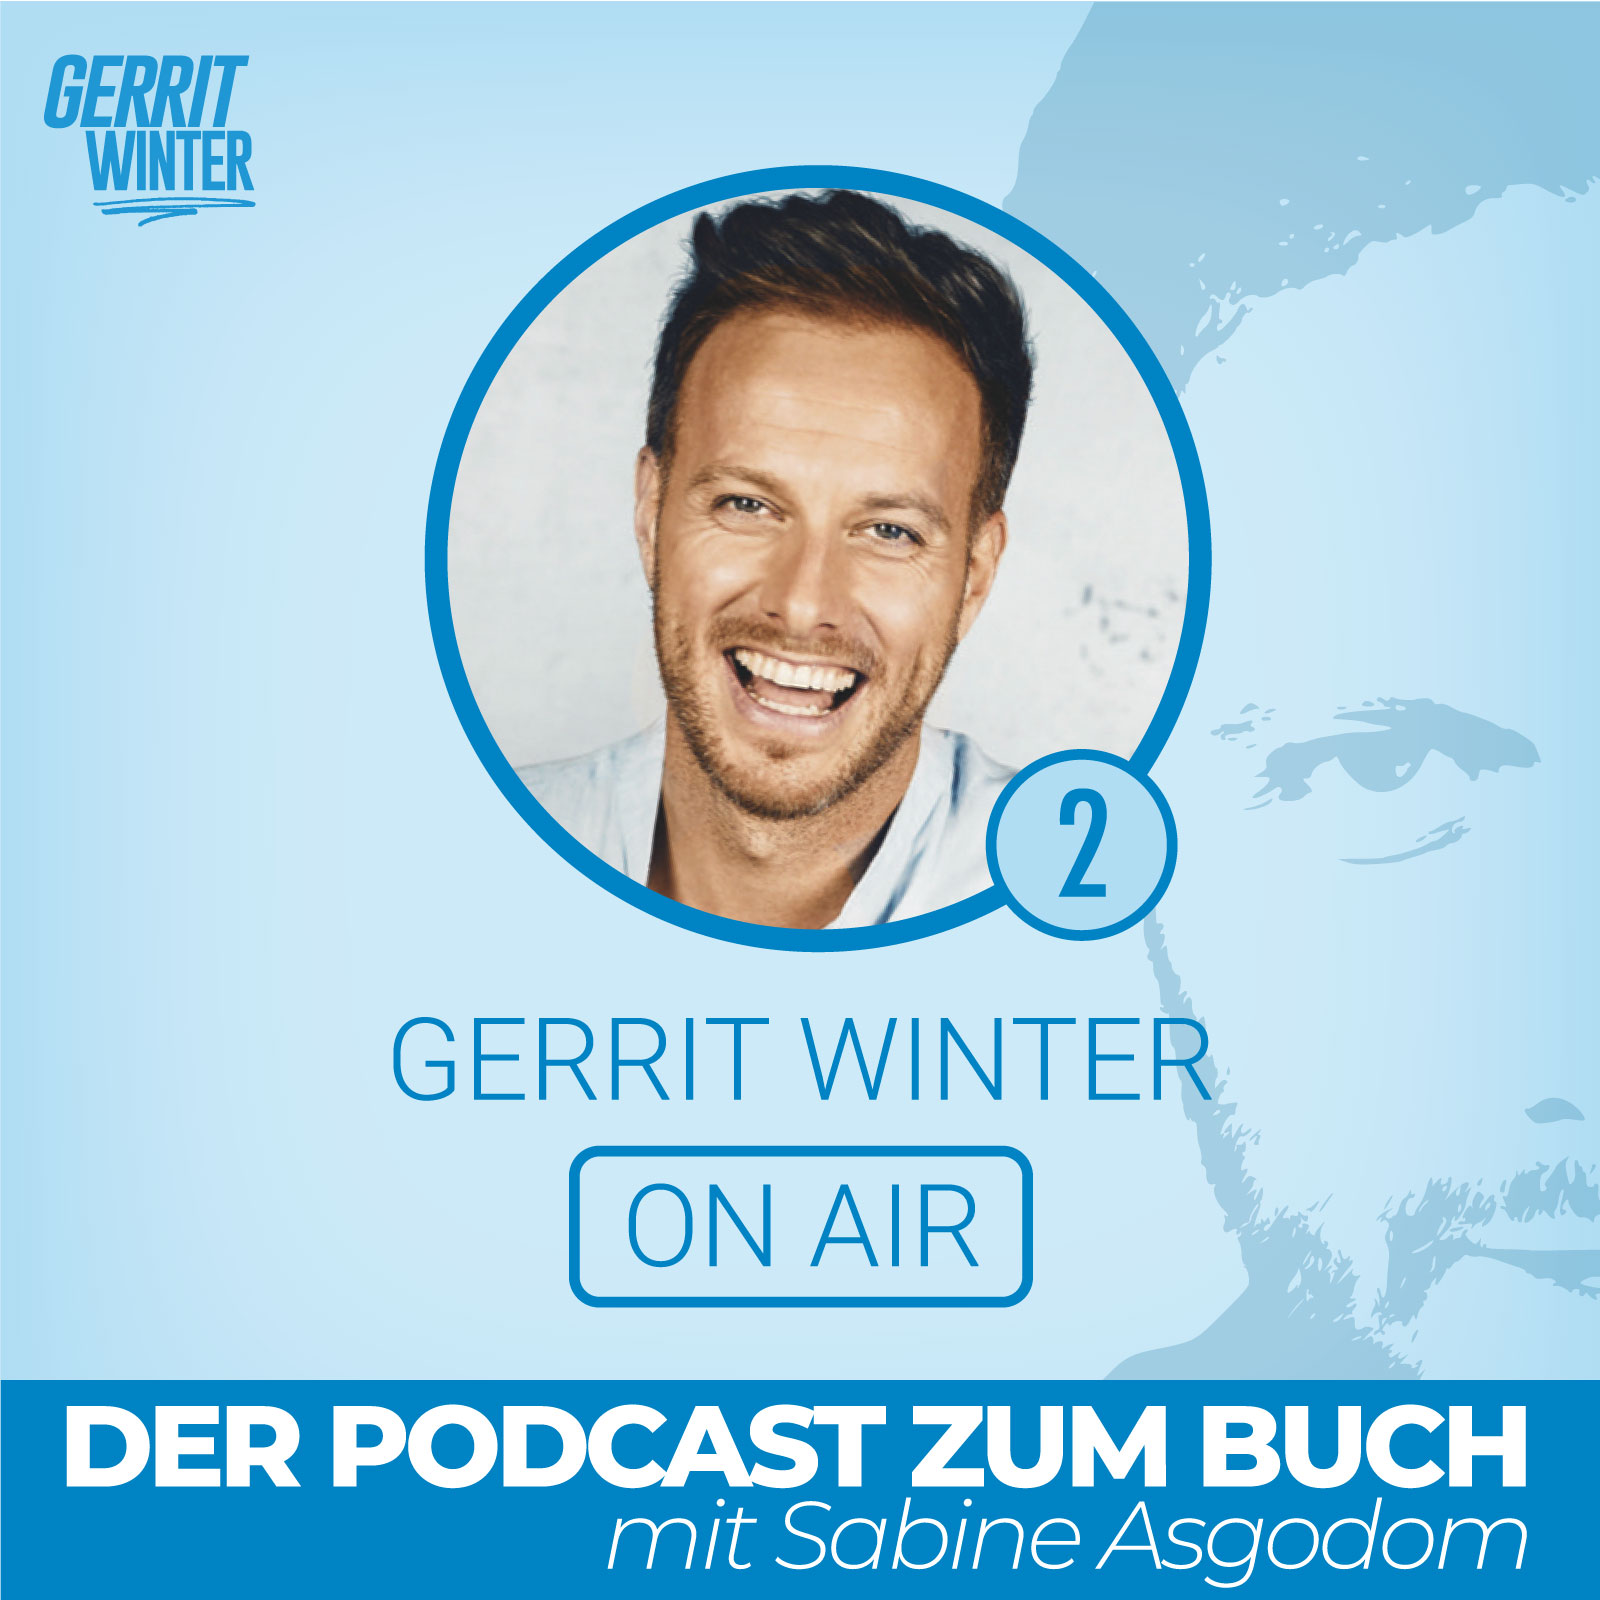 Gerrit Winter Podcast ON AIR SPecial zum Buch Teil 2 hier anhören